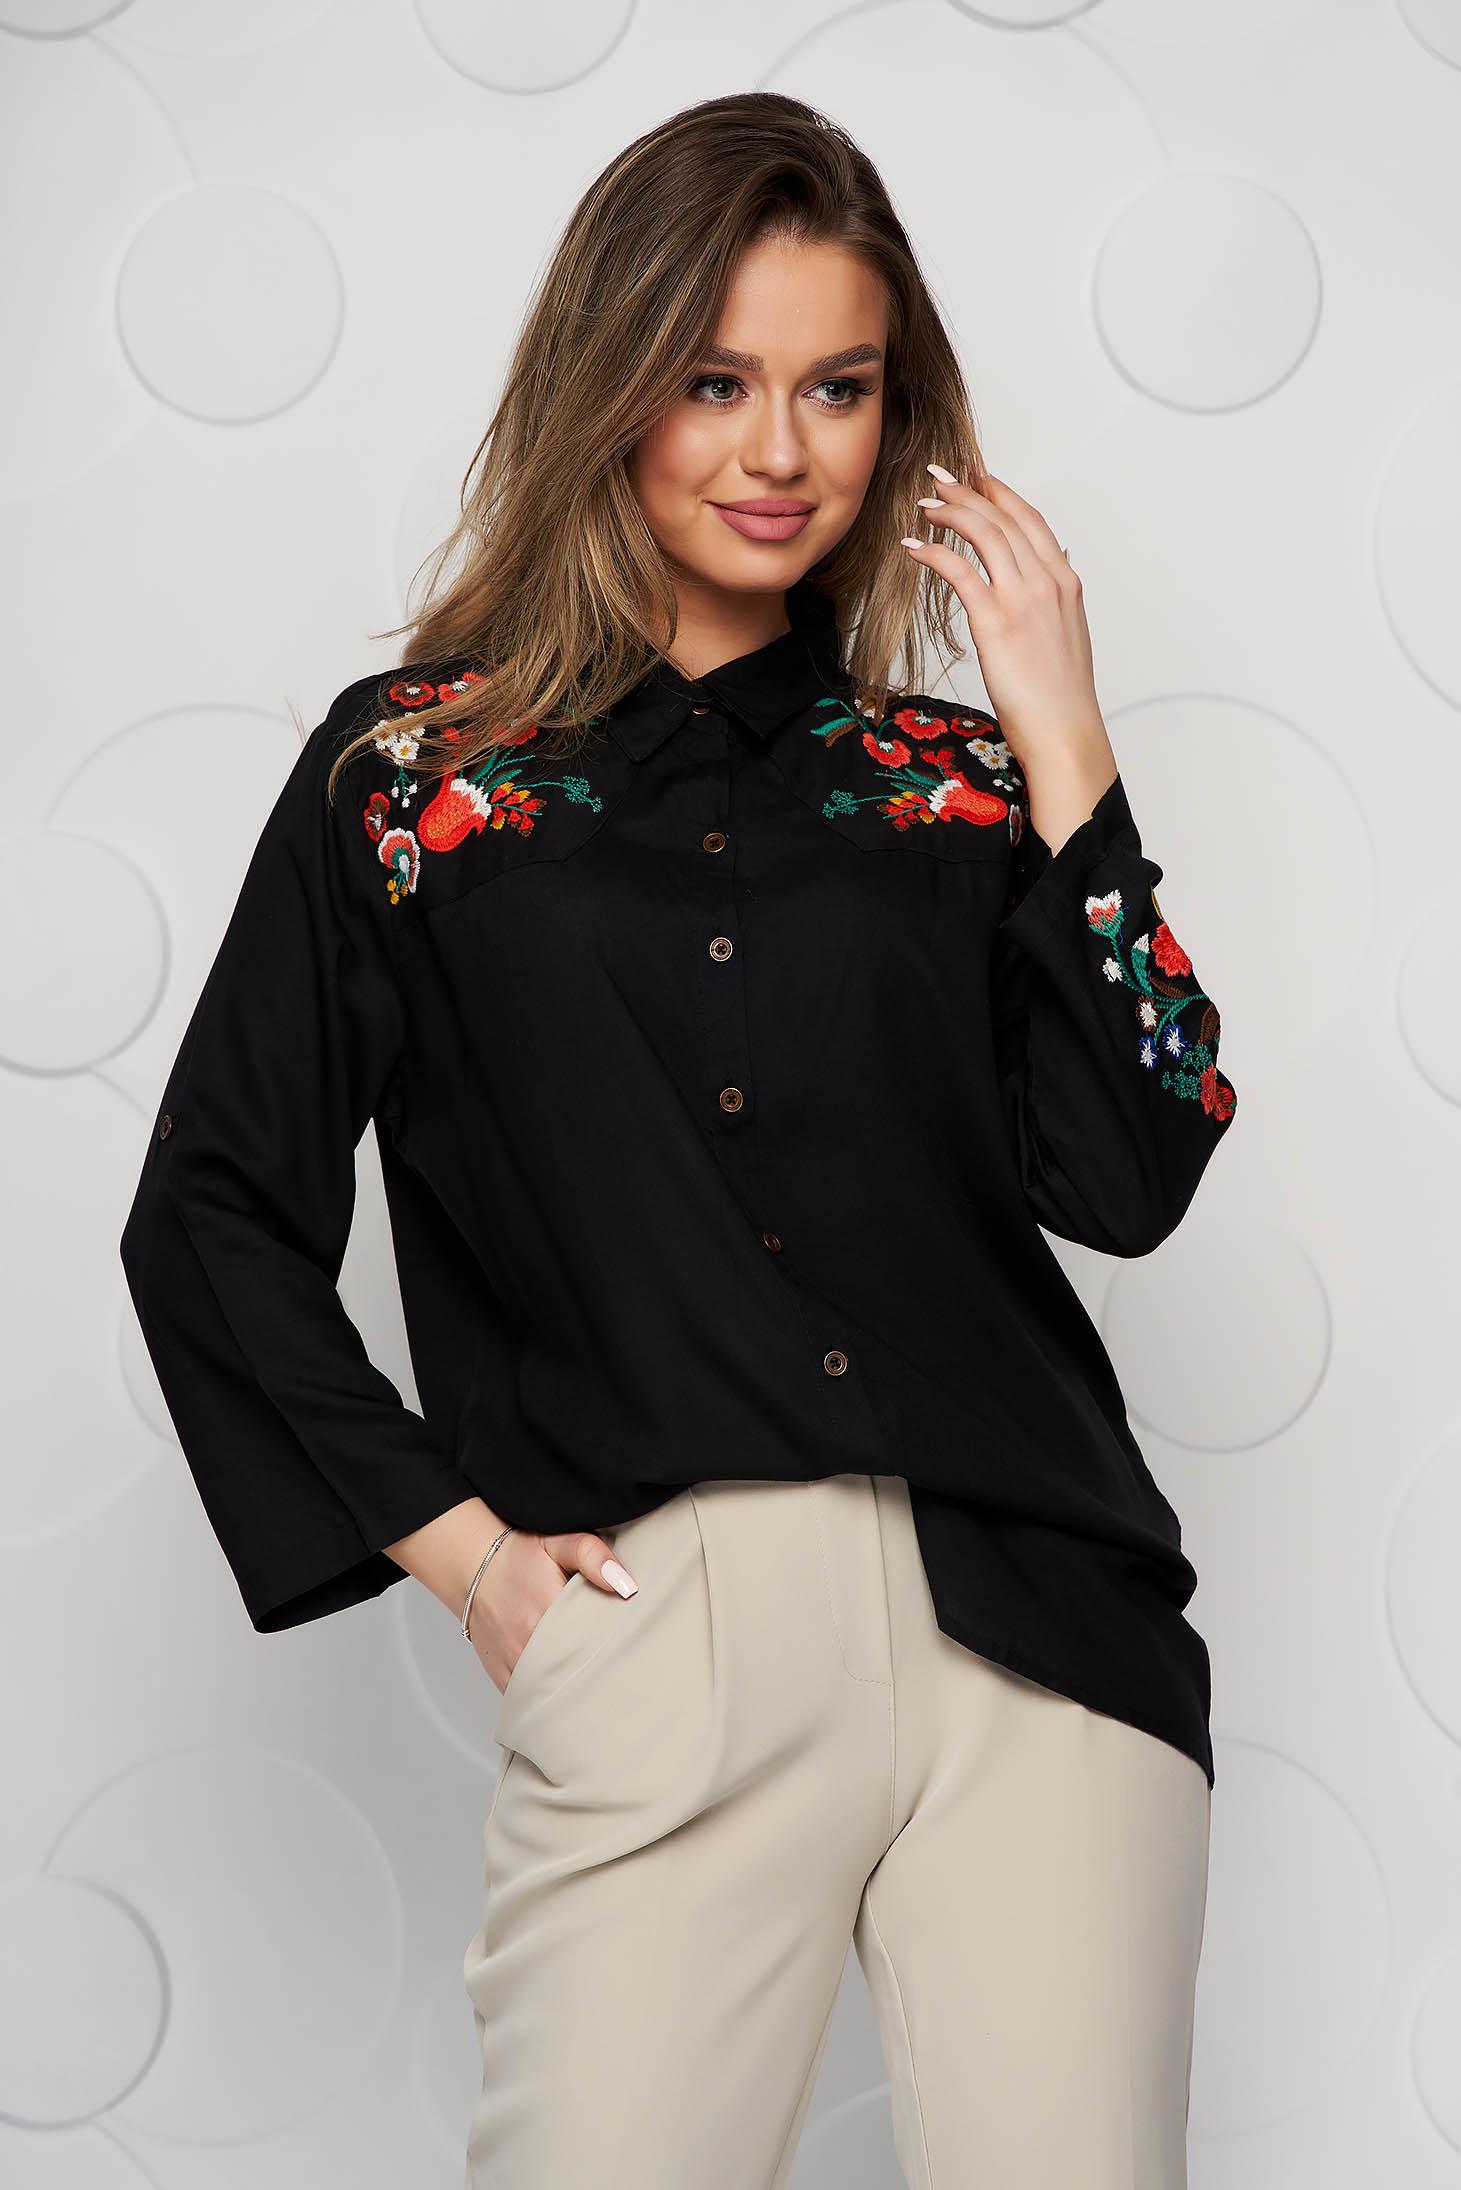 Camasa dama SunShine neagra din bumbac usor elastic cu croi larg si broderie florala